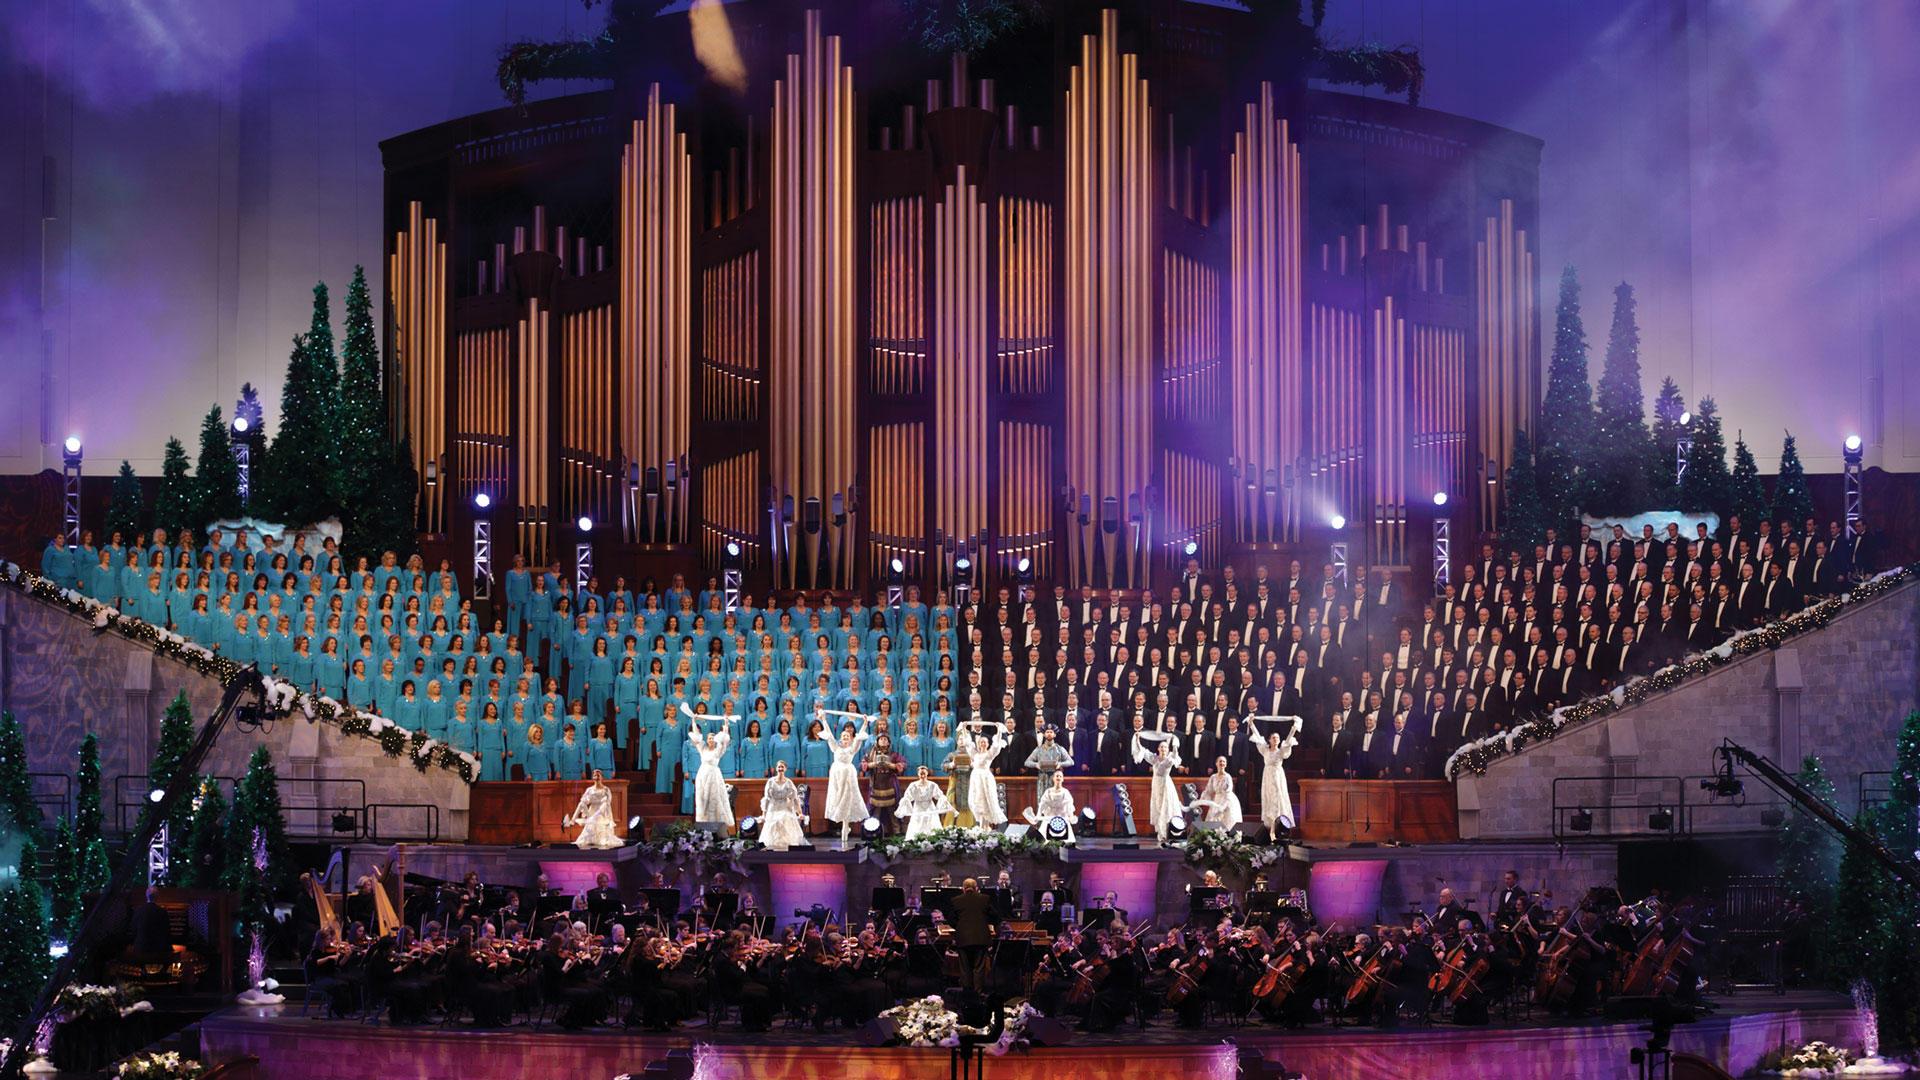 mormon tabernacle choir performing